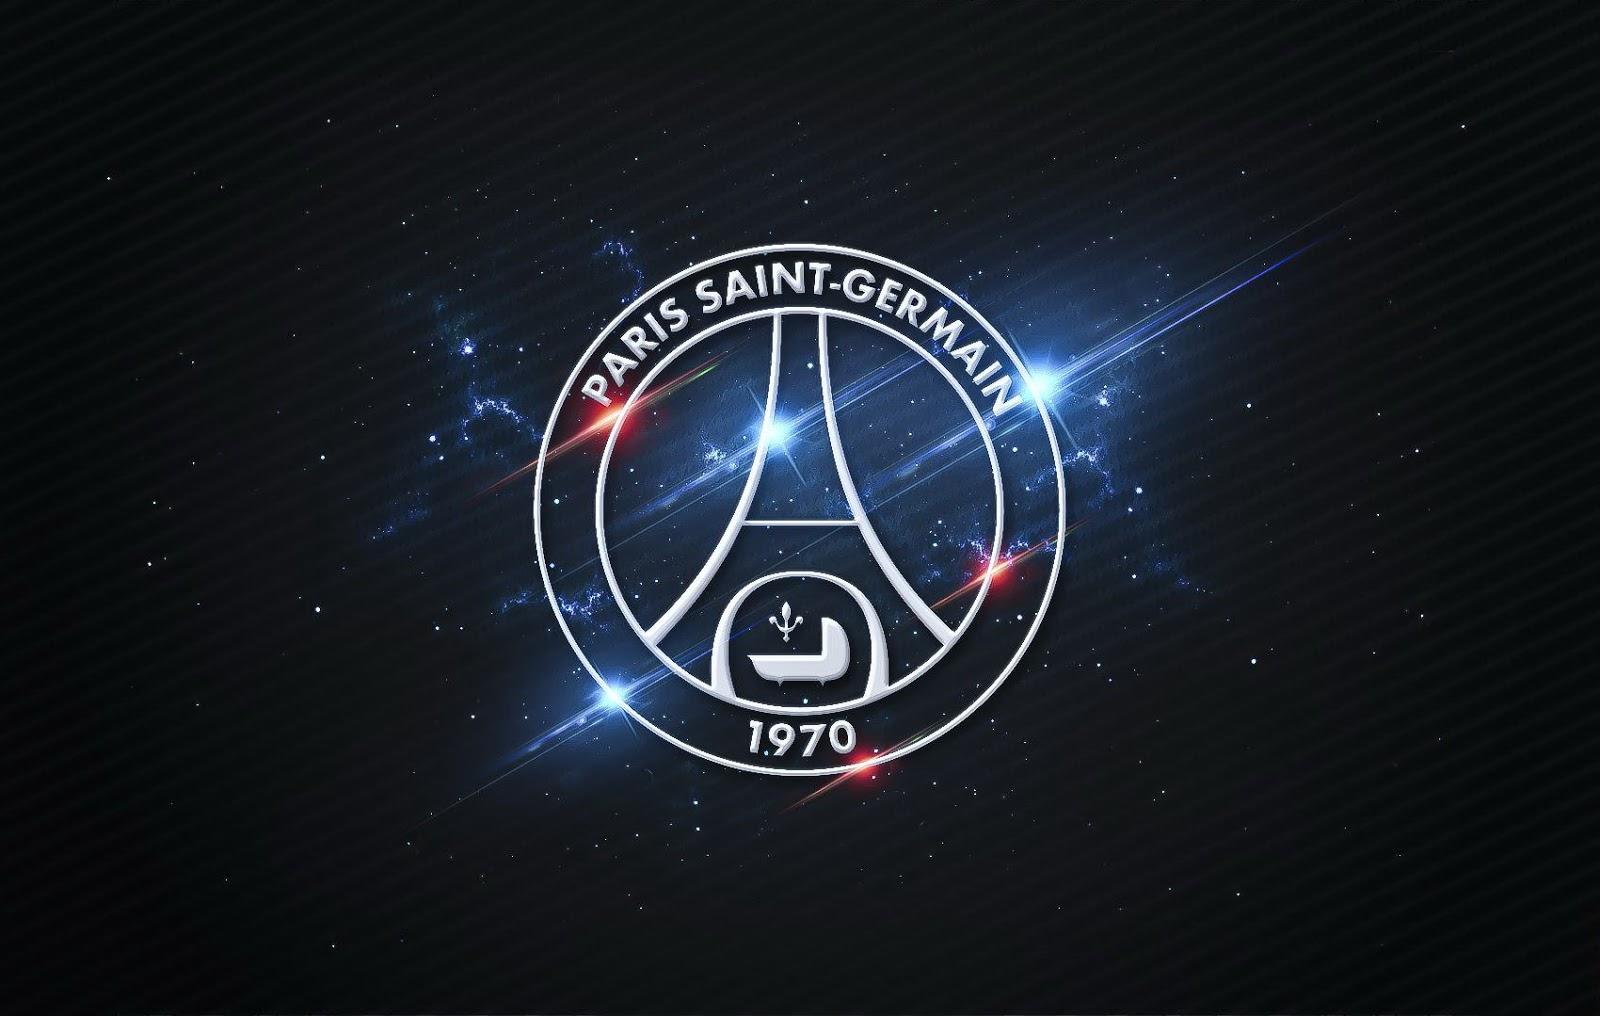 reebok classic sneakers - PSG (Paris-Saint Germain F.C) HD Pictures & Wallpapers | My HD ...